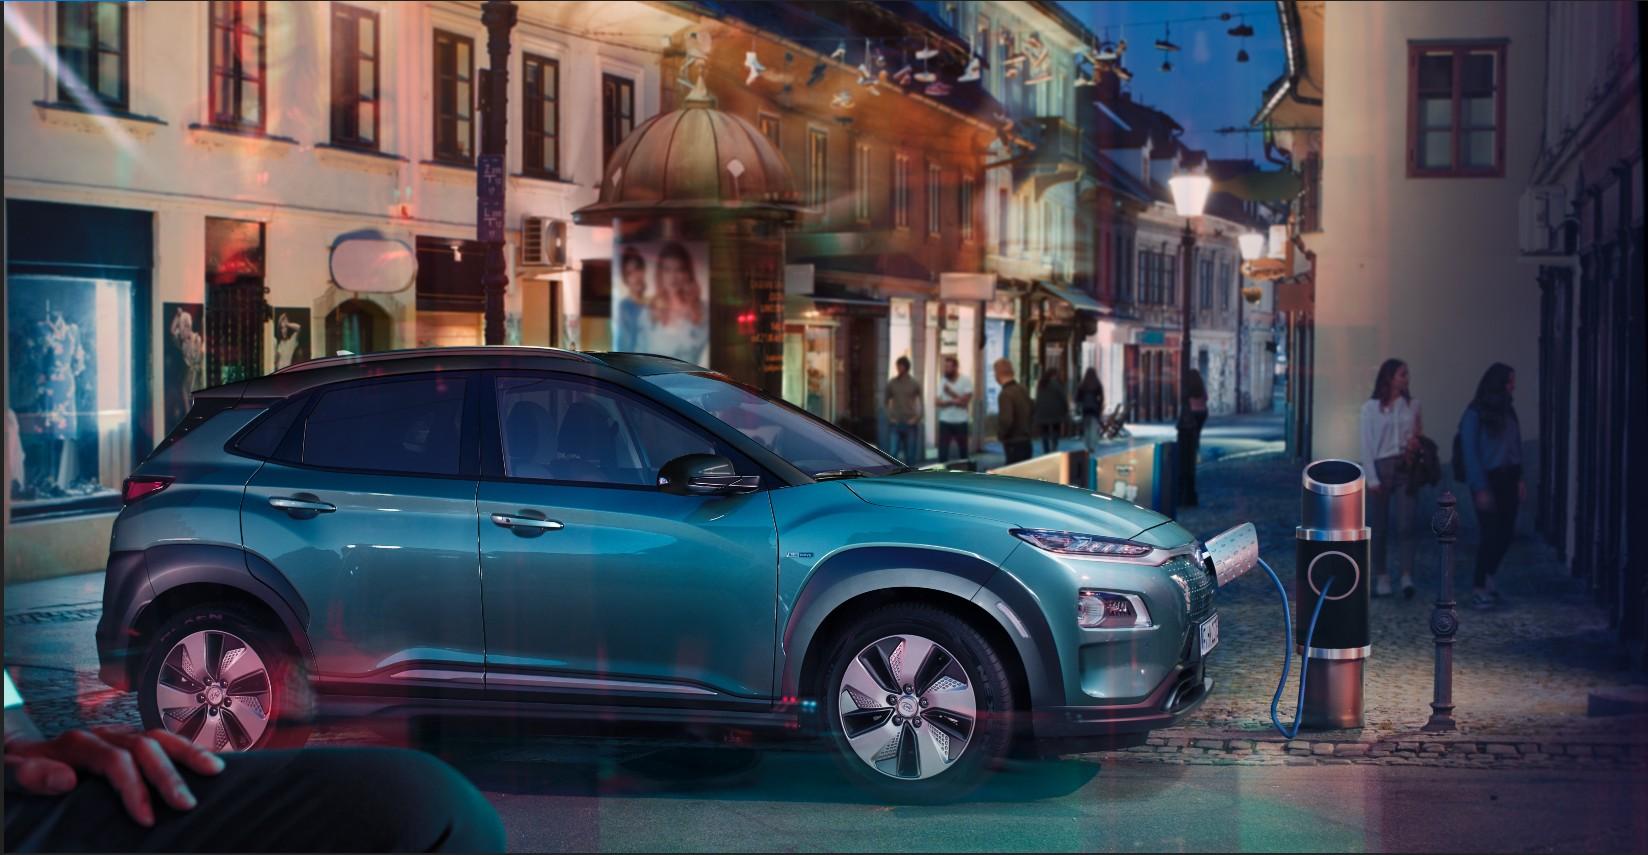 Discover the All-New Hyundai Kona Electric